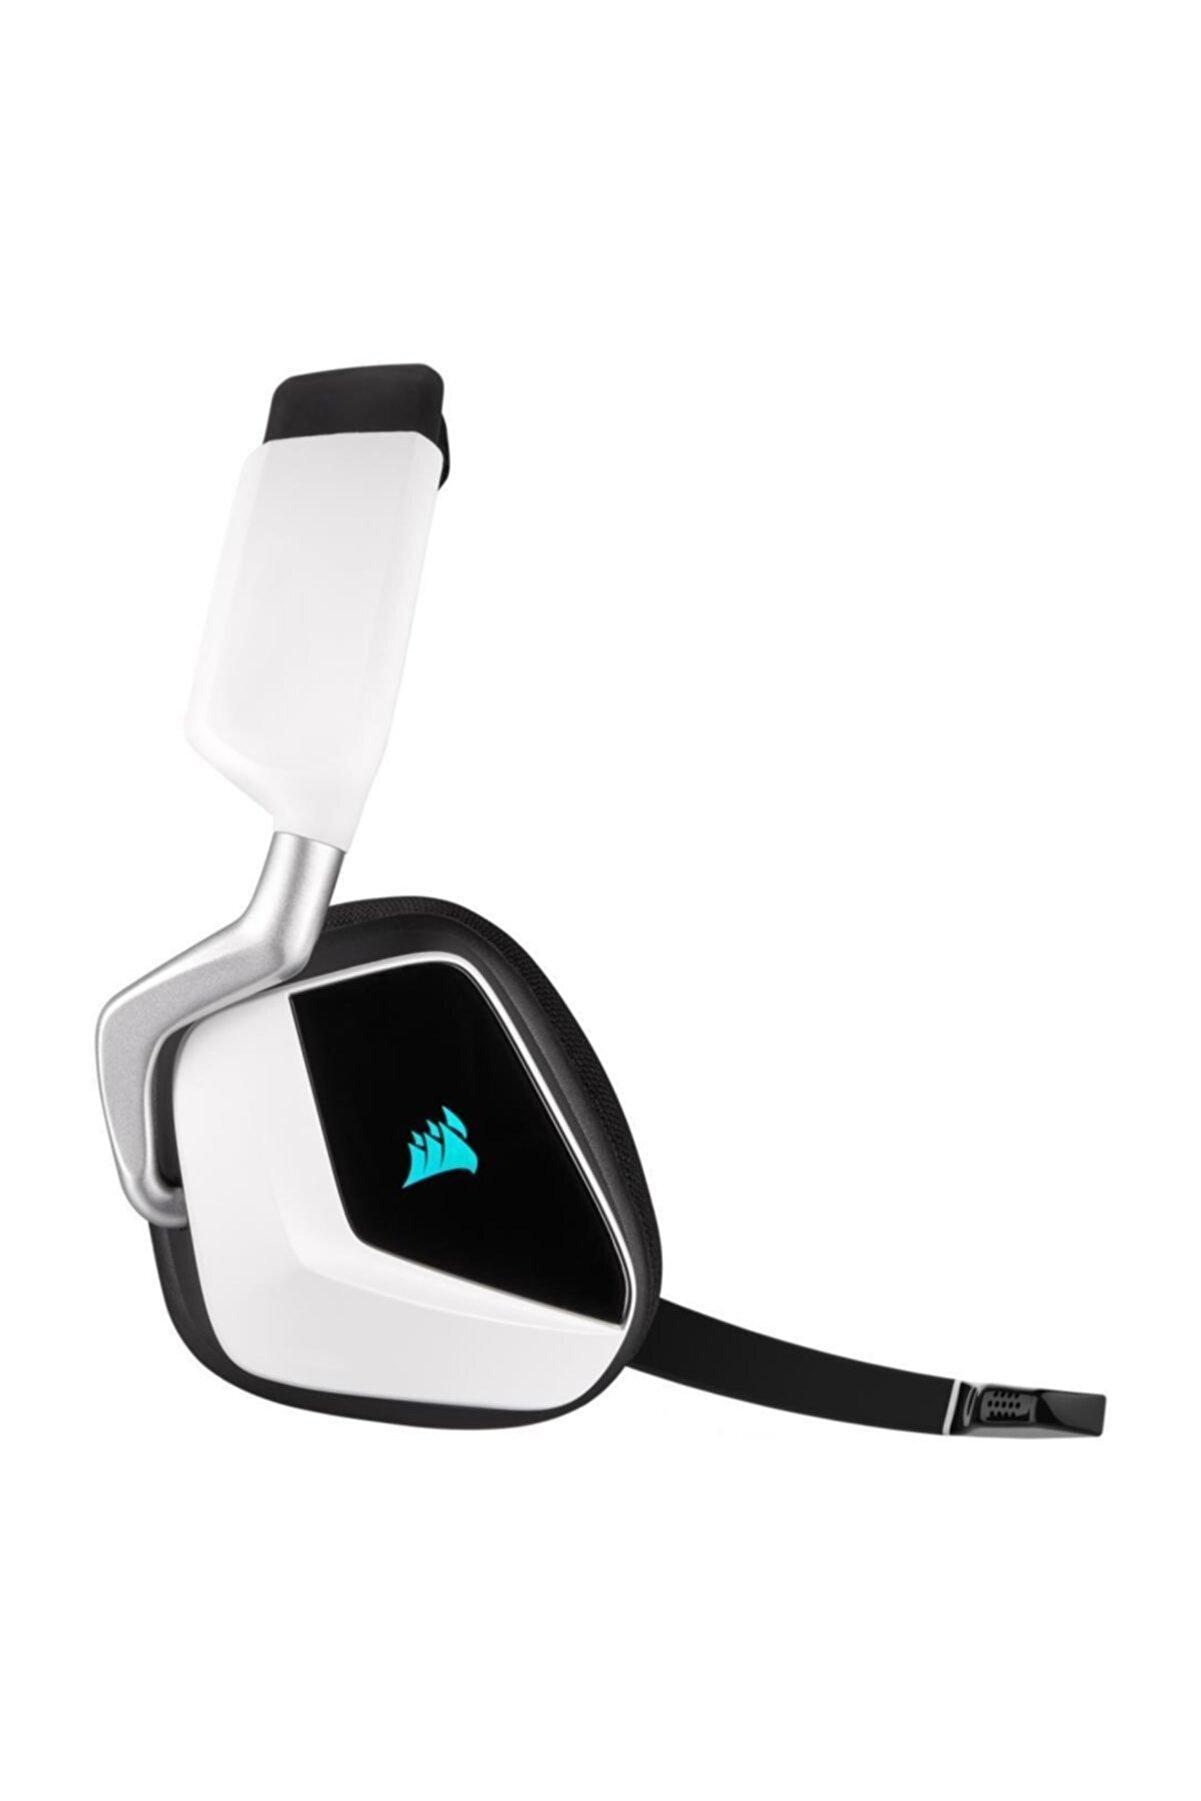 Corsair Void Rgb Elite 7.1 Beyaz Kablosuz Oyuncu Kulaklığı